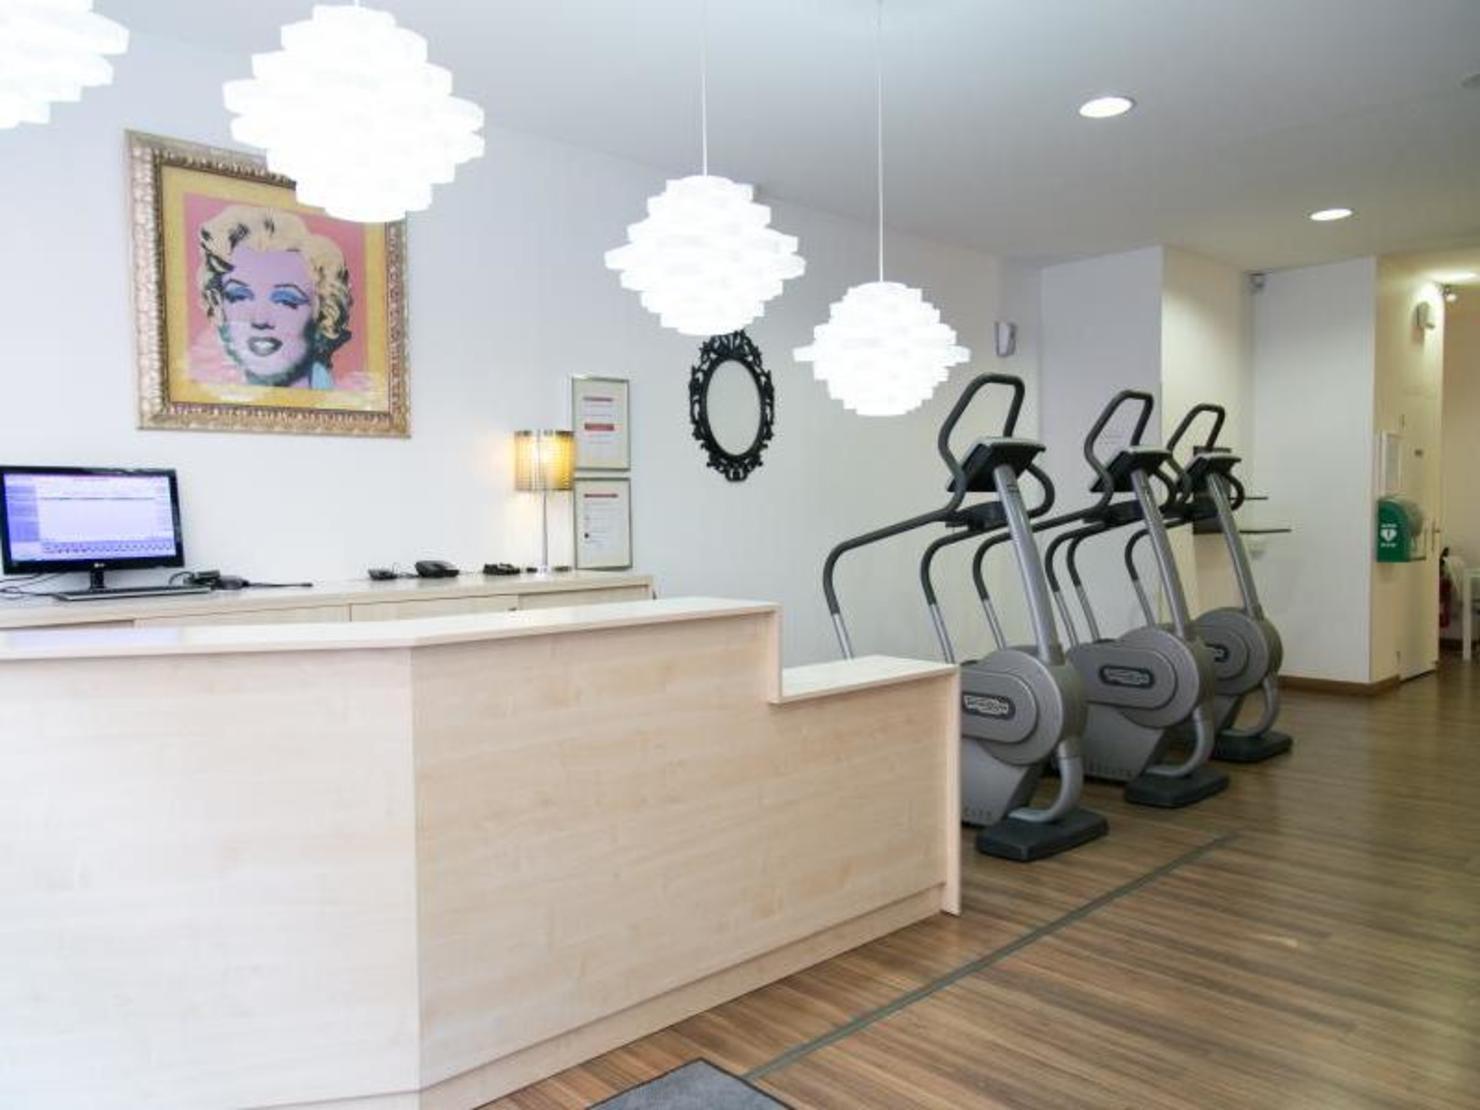 feel sport strasbourg 1 maire kuss tarifs avis horaires essai gratuit. Black Bedroom Furniture Sets. Home Design Ideas